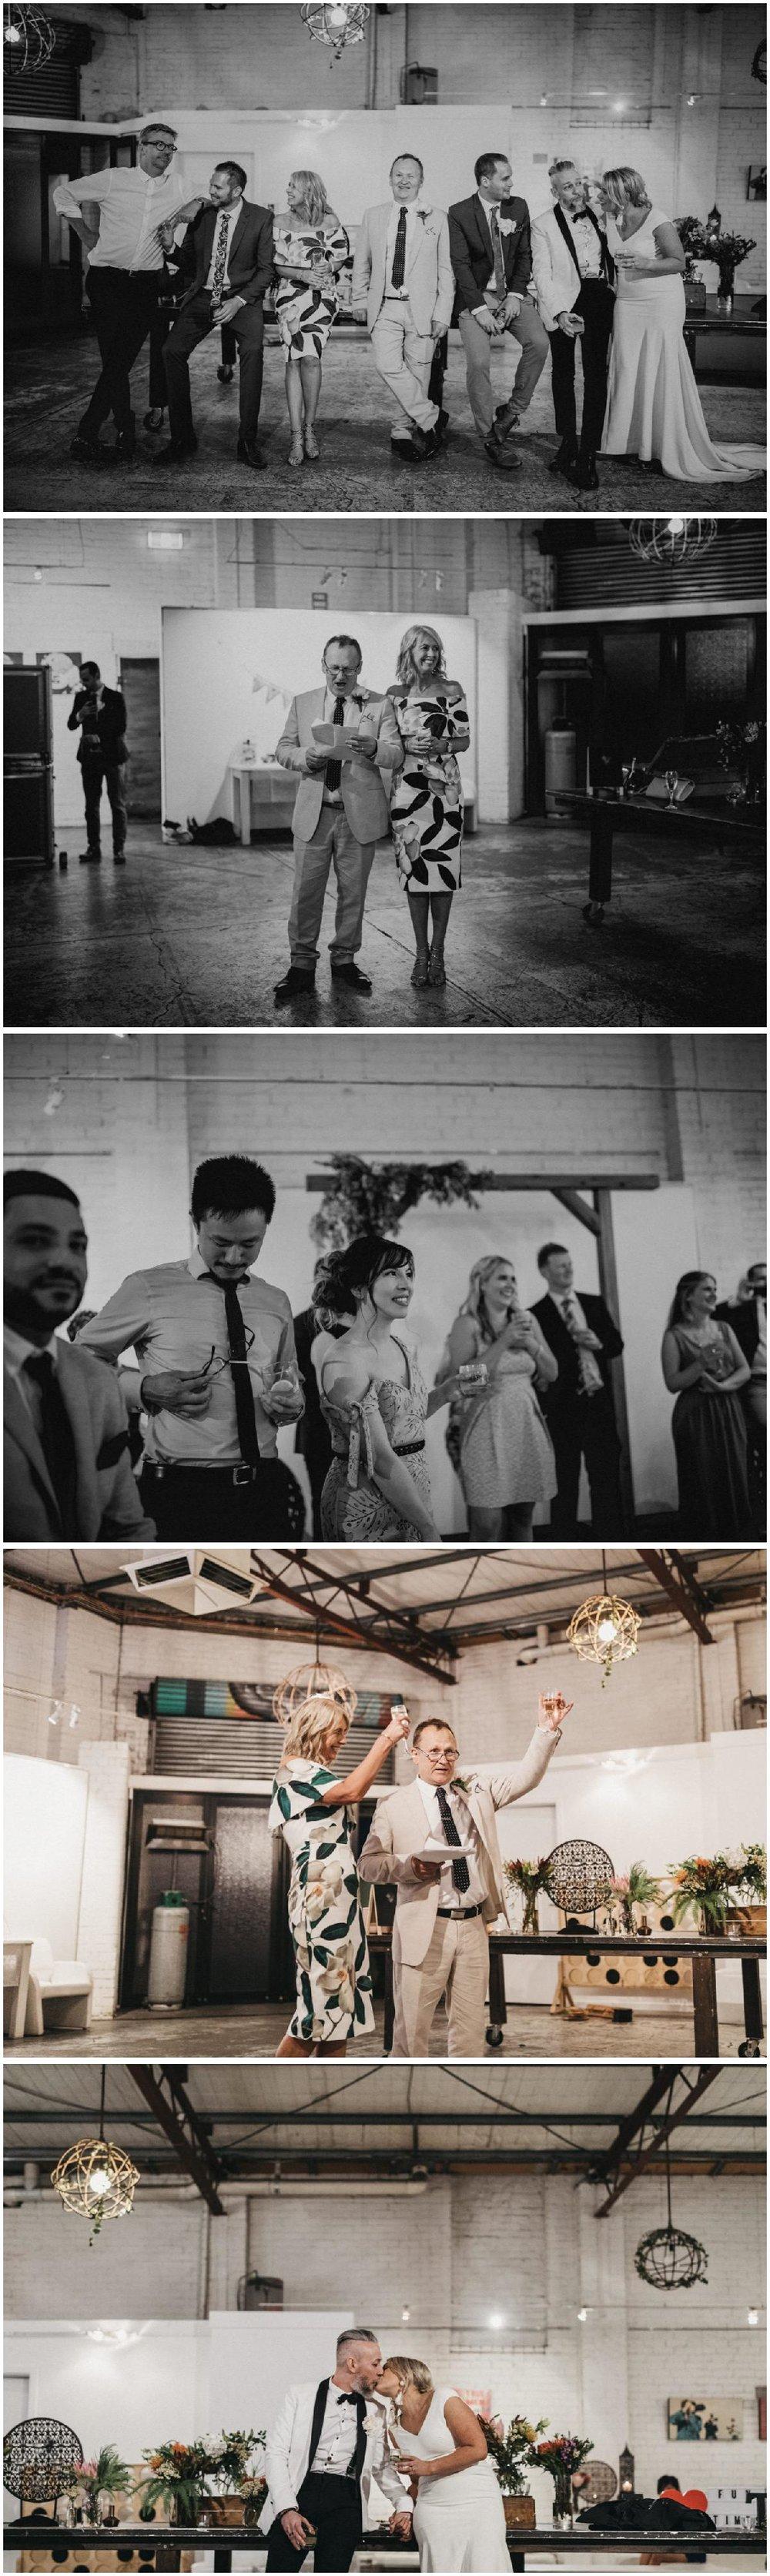 Emily_Tim_Melbourne_Beach_city_wedding_167.jpg